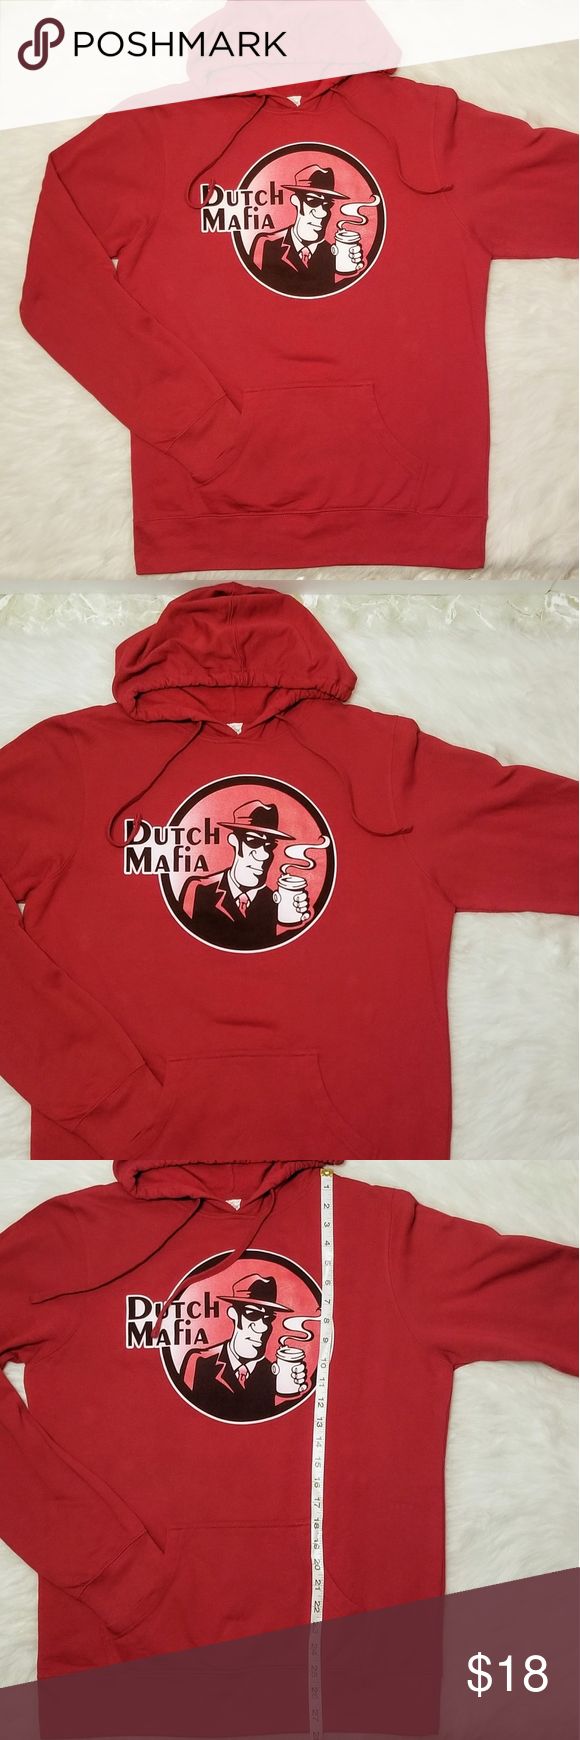 DUTCH BROS MAFIA Brothers Hoodie Dutch Mafia Life Drawstring hood Kangaroo front pocket  Unisex  Cotton/ Polyester Dutch Bros Shirts Sweatshirts & Hoodies #dutchbros